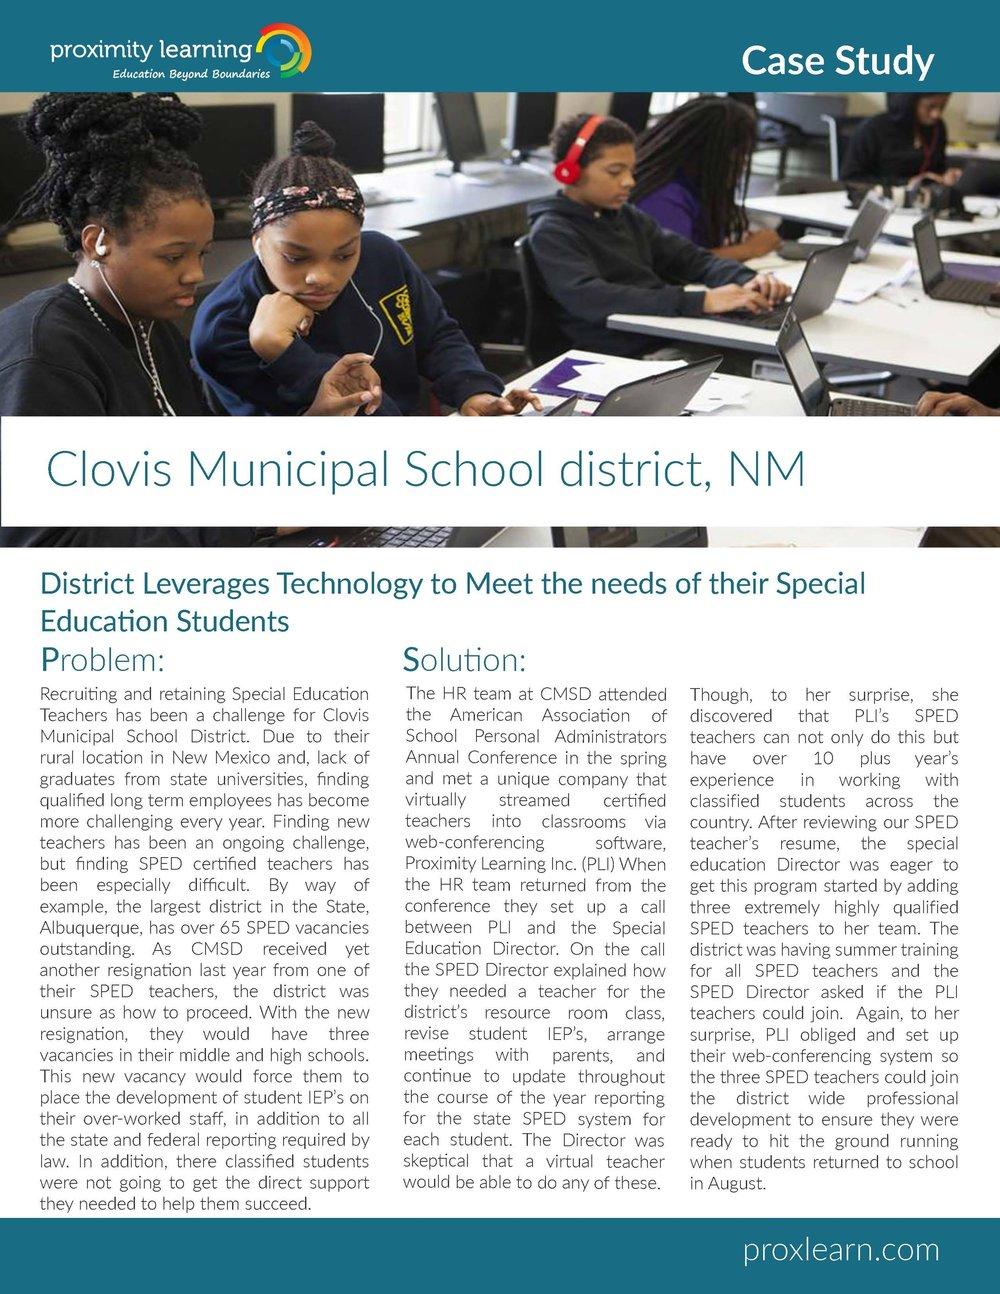 Clovis Municipal School District Case Study.jpg